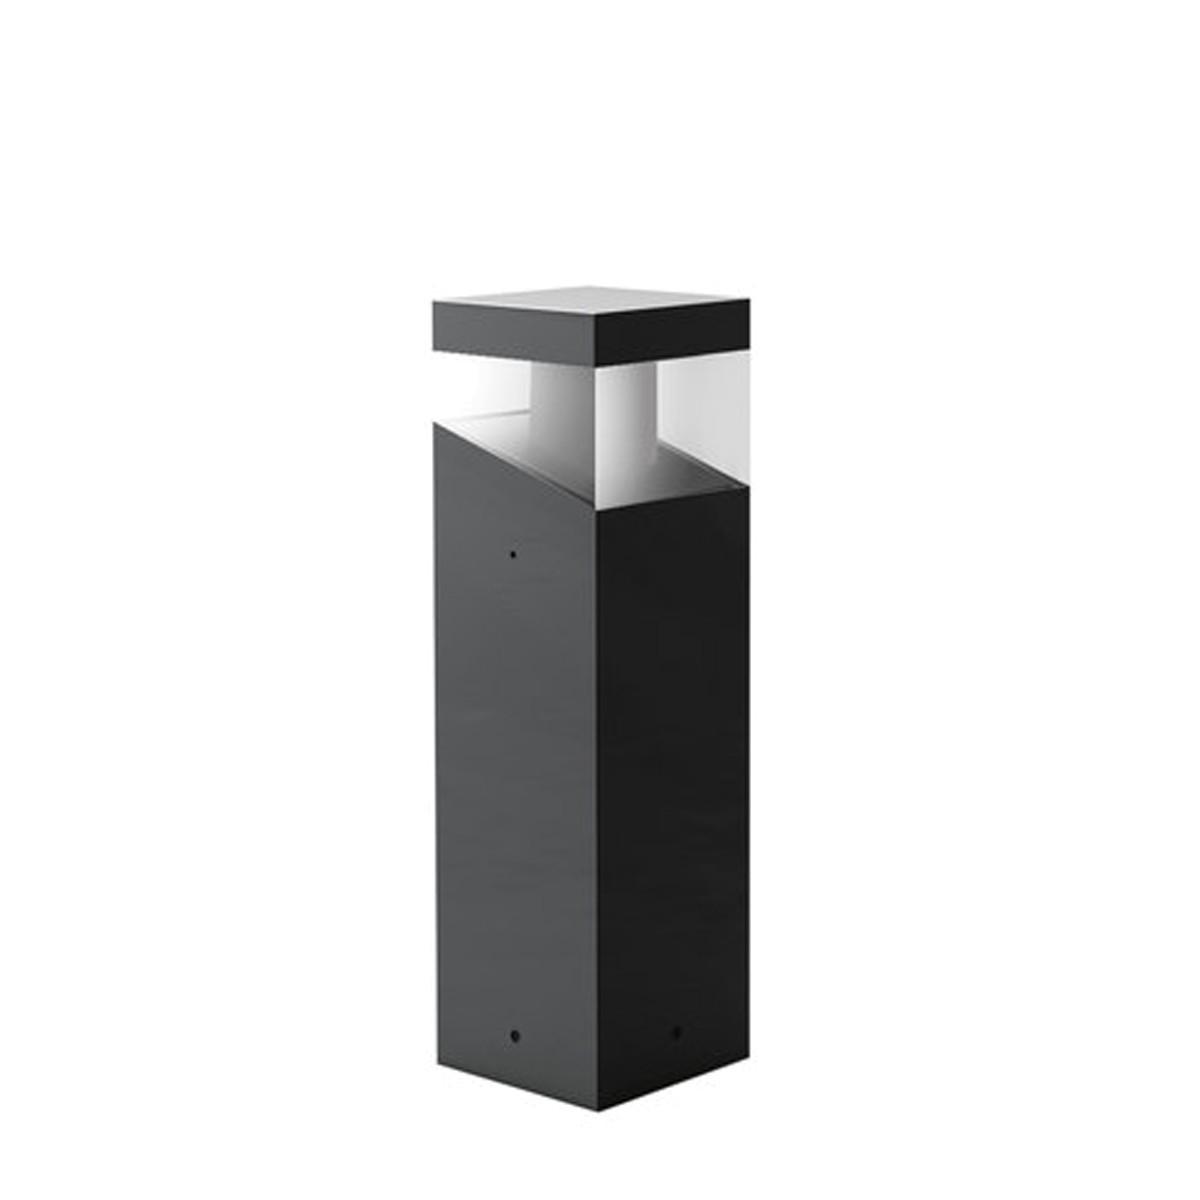 Artemide Outdoor Tetragono LED Pollerleuchte, Höhe: 45 cm, anthrazitgrau